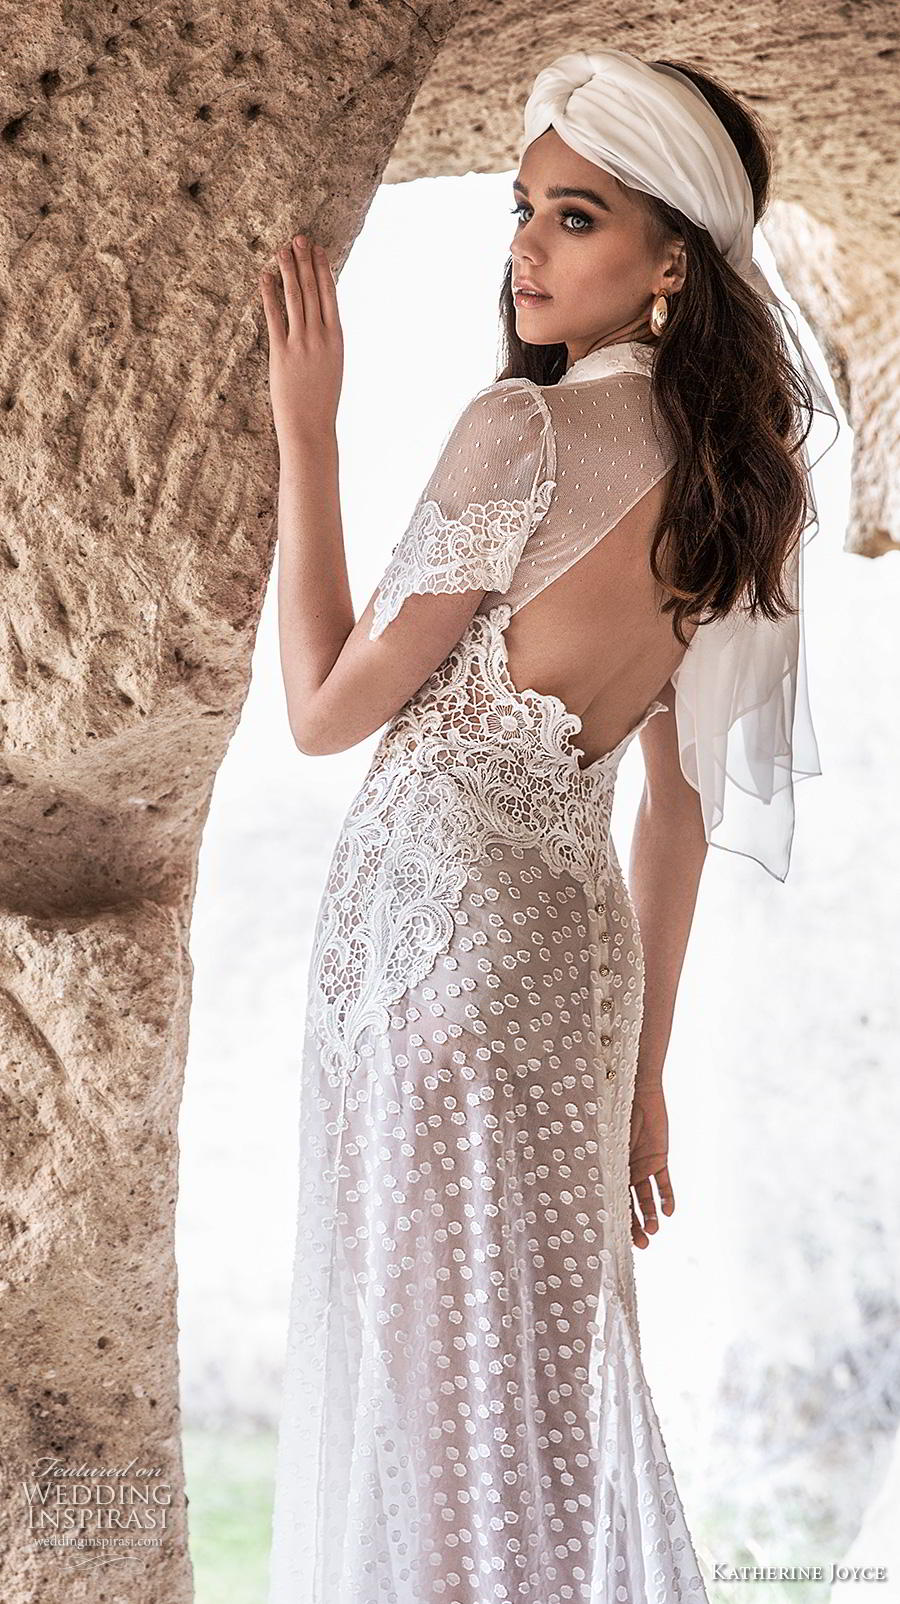 katherine joyce 2020 bridal short sleeves high collar neck slit bodice full embellishment bohemian soft a  line wedding dress keyhole back chapel train (8) zbv